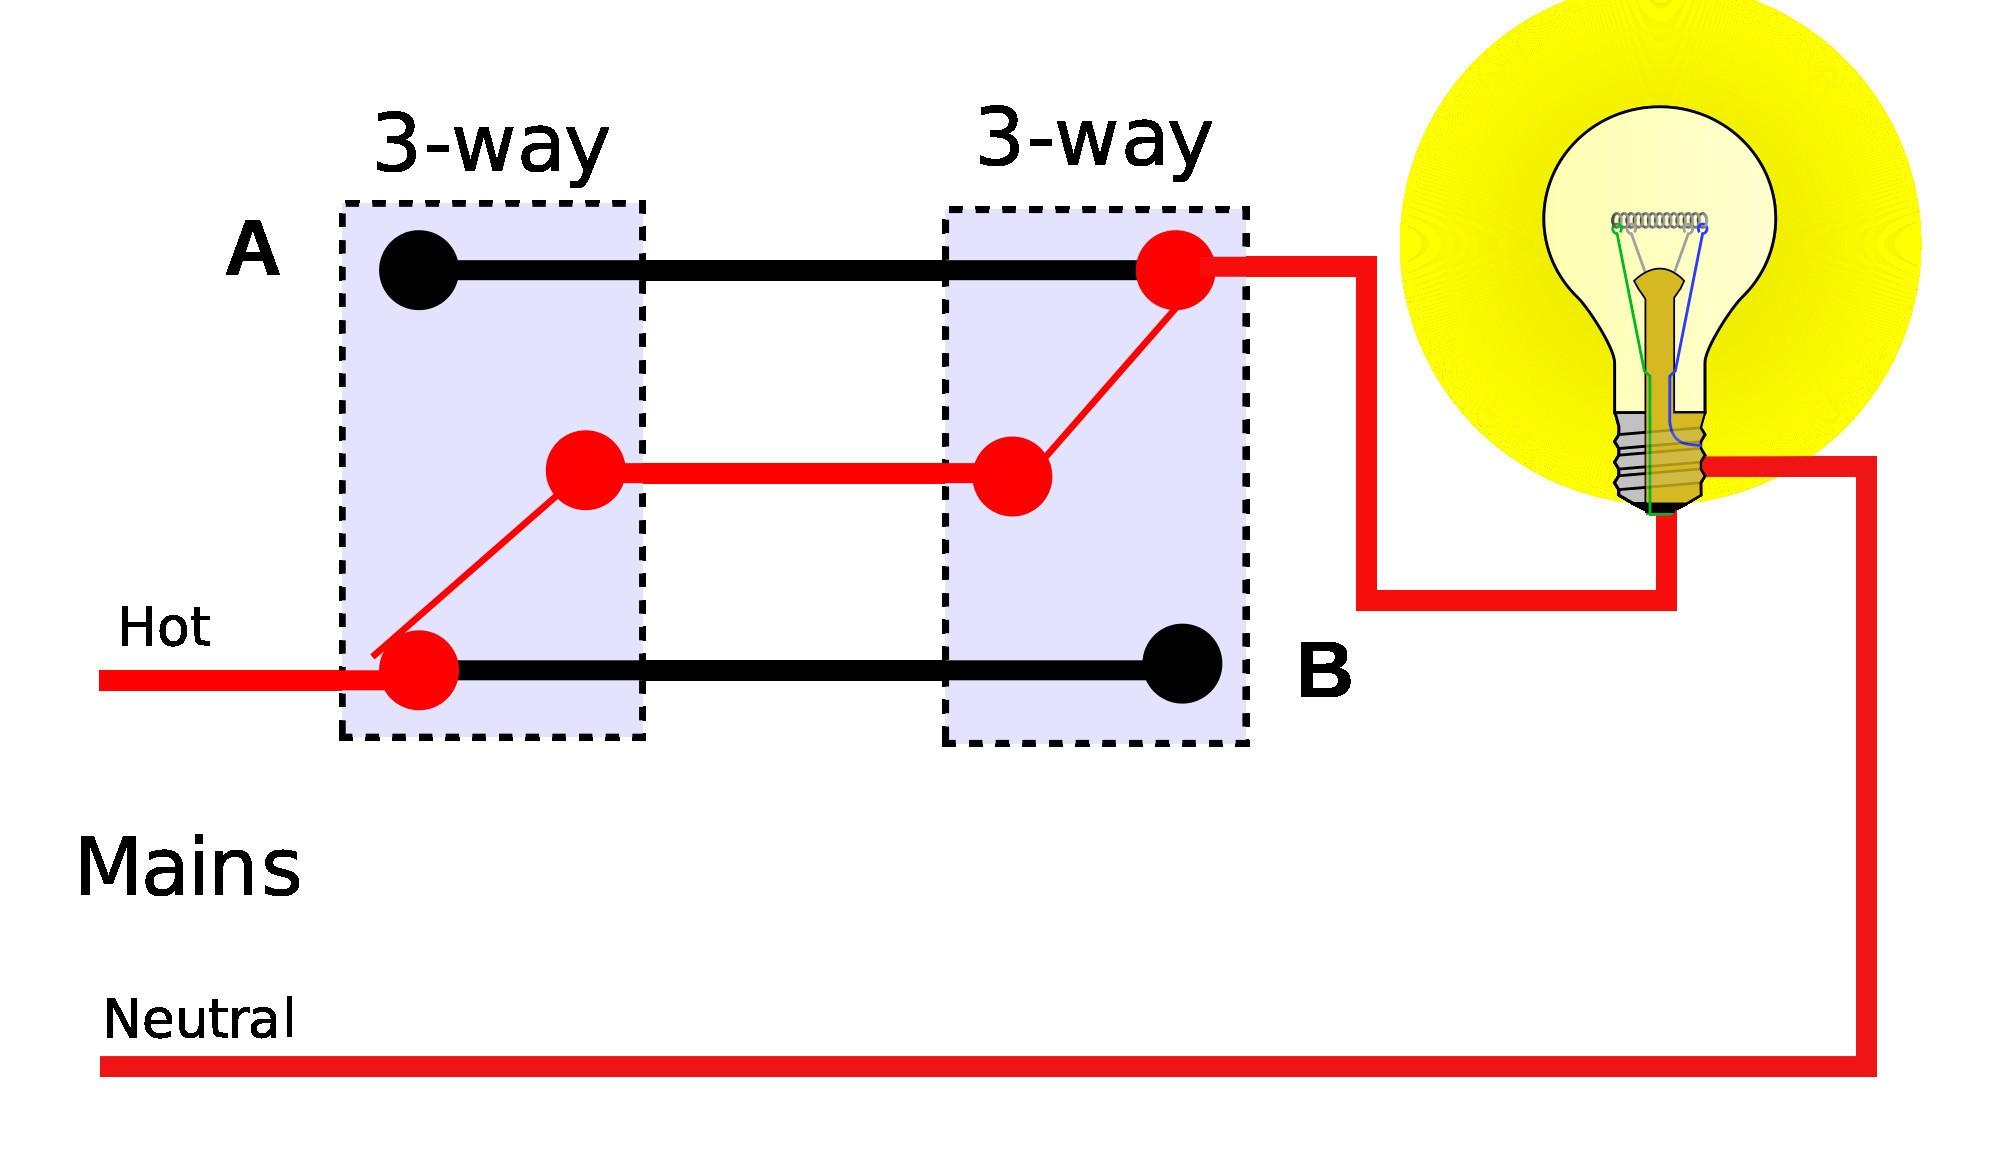 4 Way Circuit Diagram - Trusted Wiring Diagrams